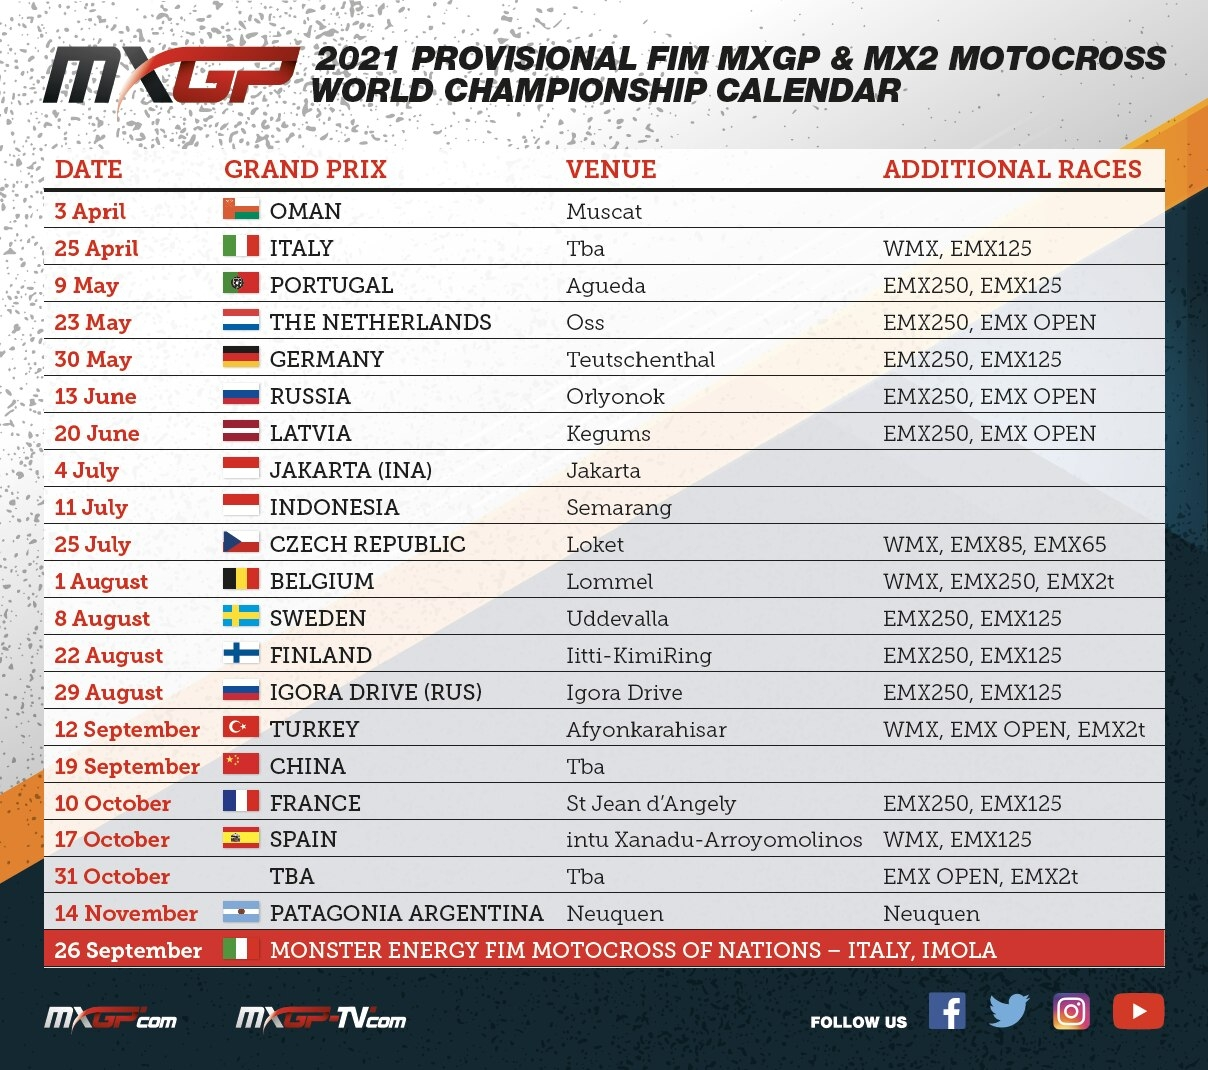 Calendario Provvisorio Mondiale Mxgp 2021 - Xoffroad inside Calendario 2021 Italia Calendarpedia Photo